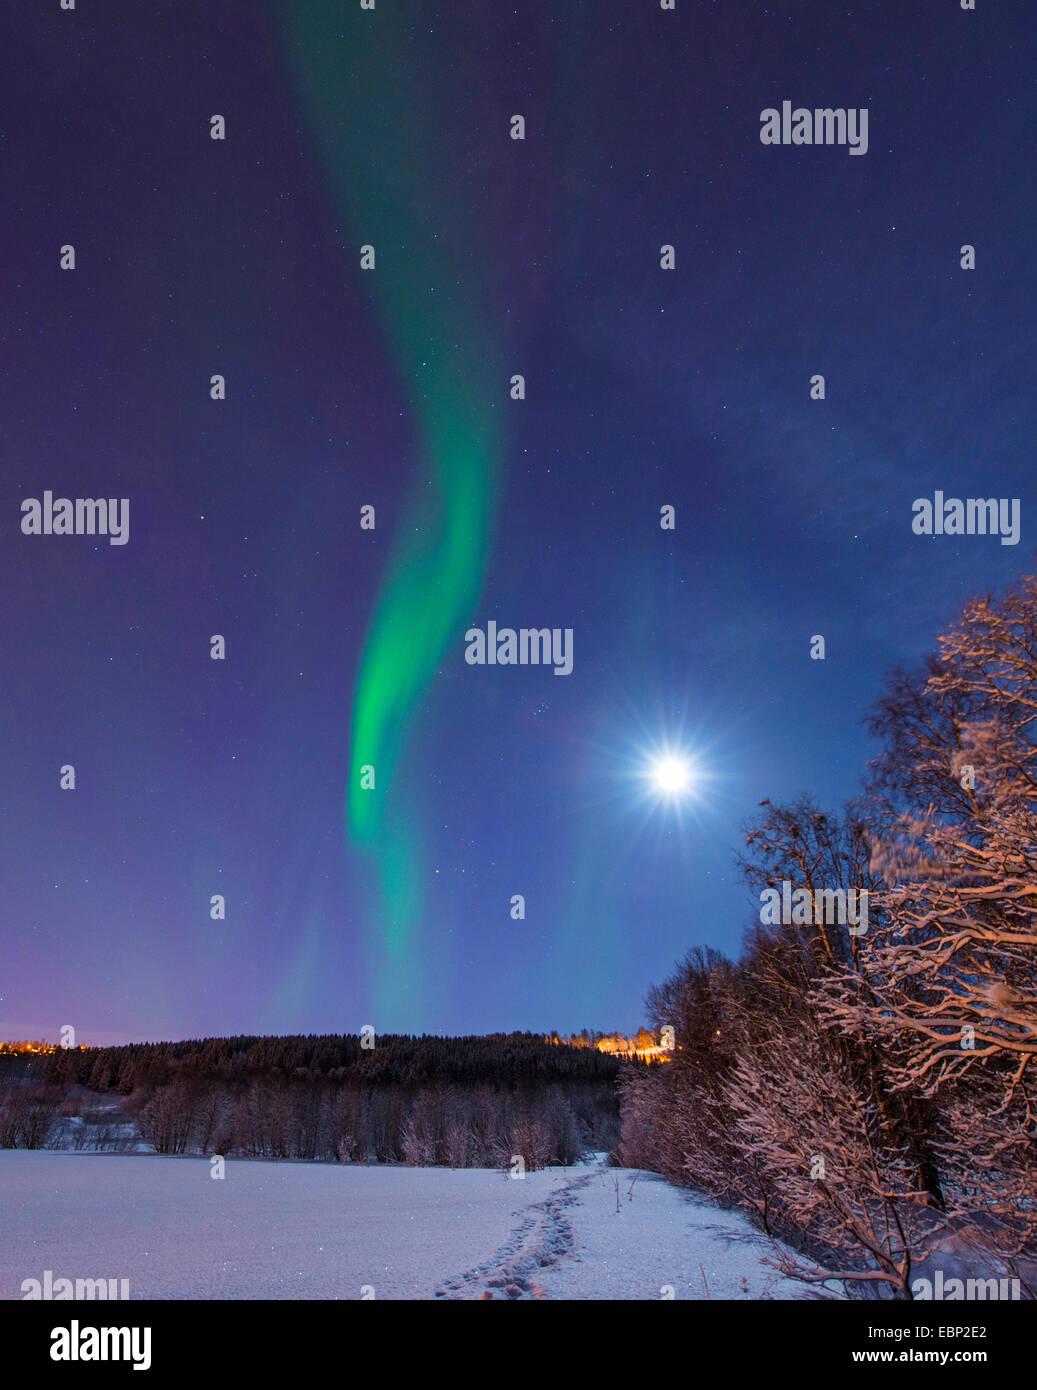 aurora and moon above winter scenery, Norway, Troms, Tromsoe - Stock Image